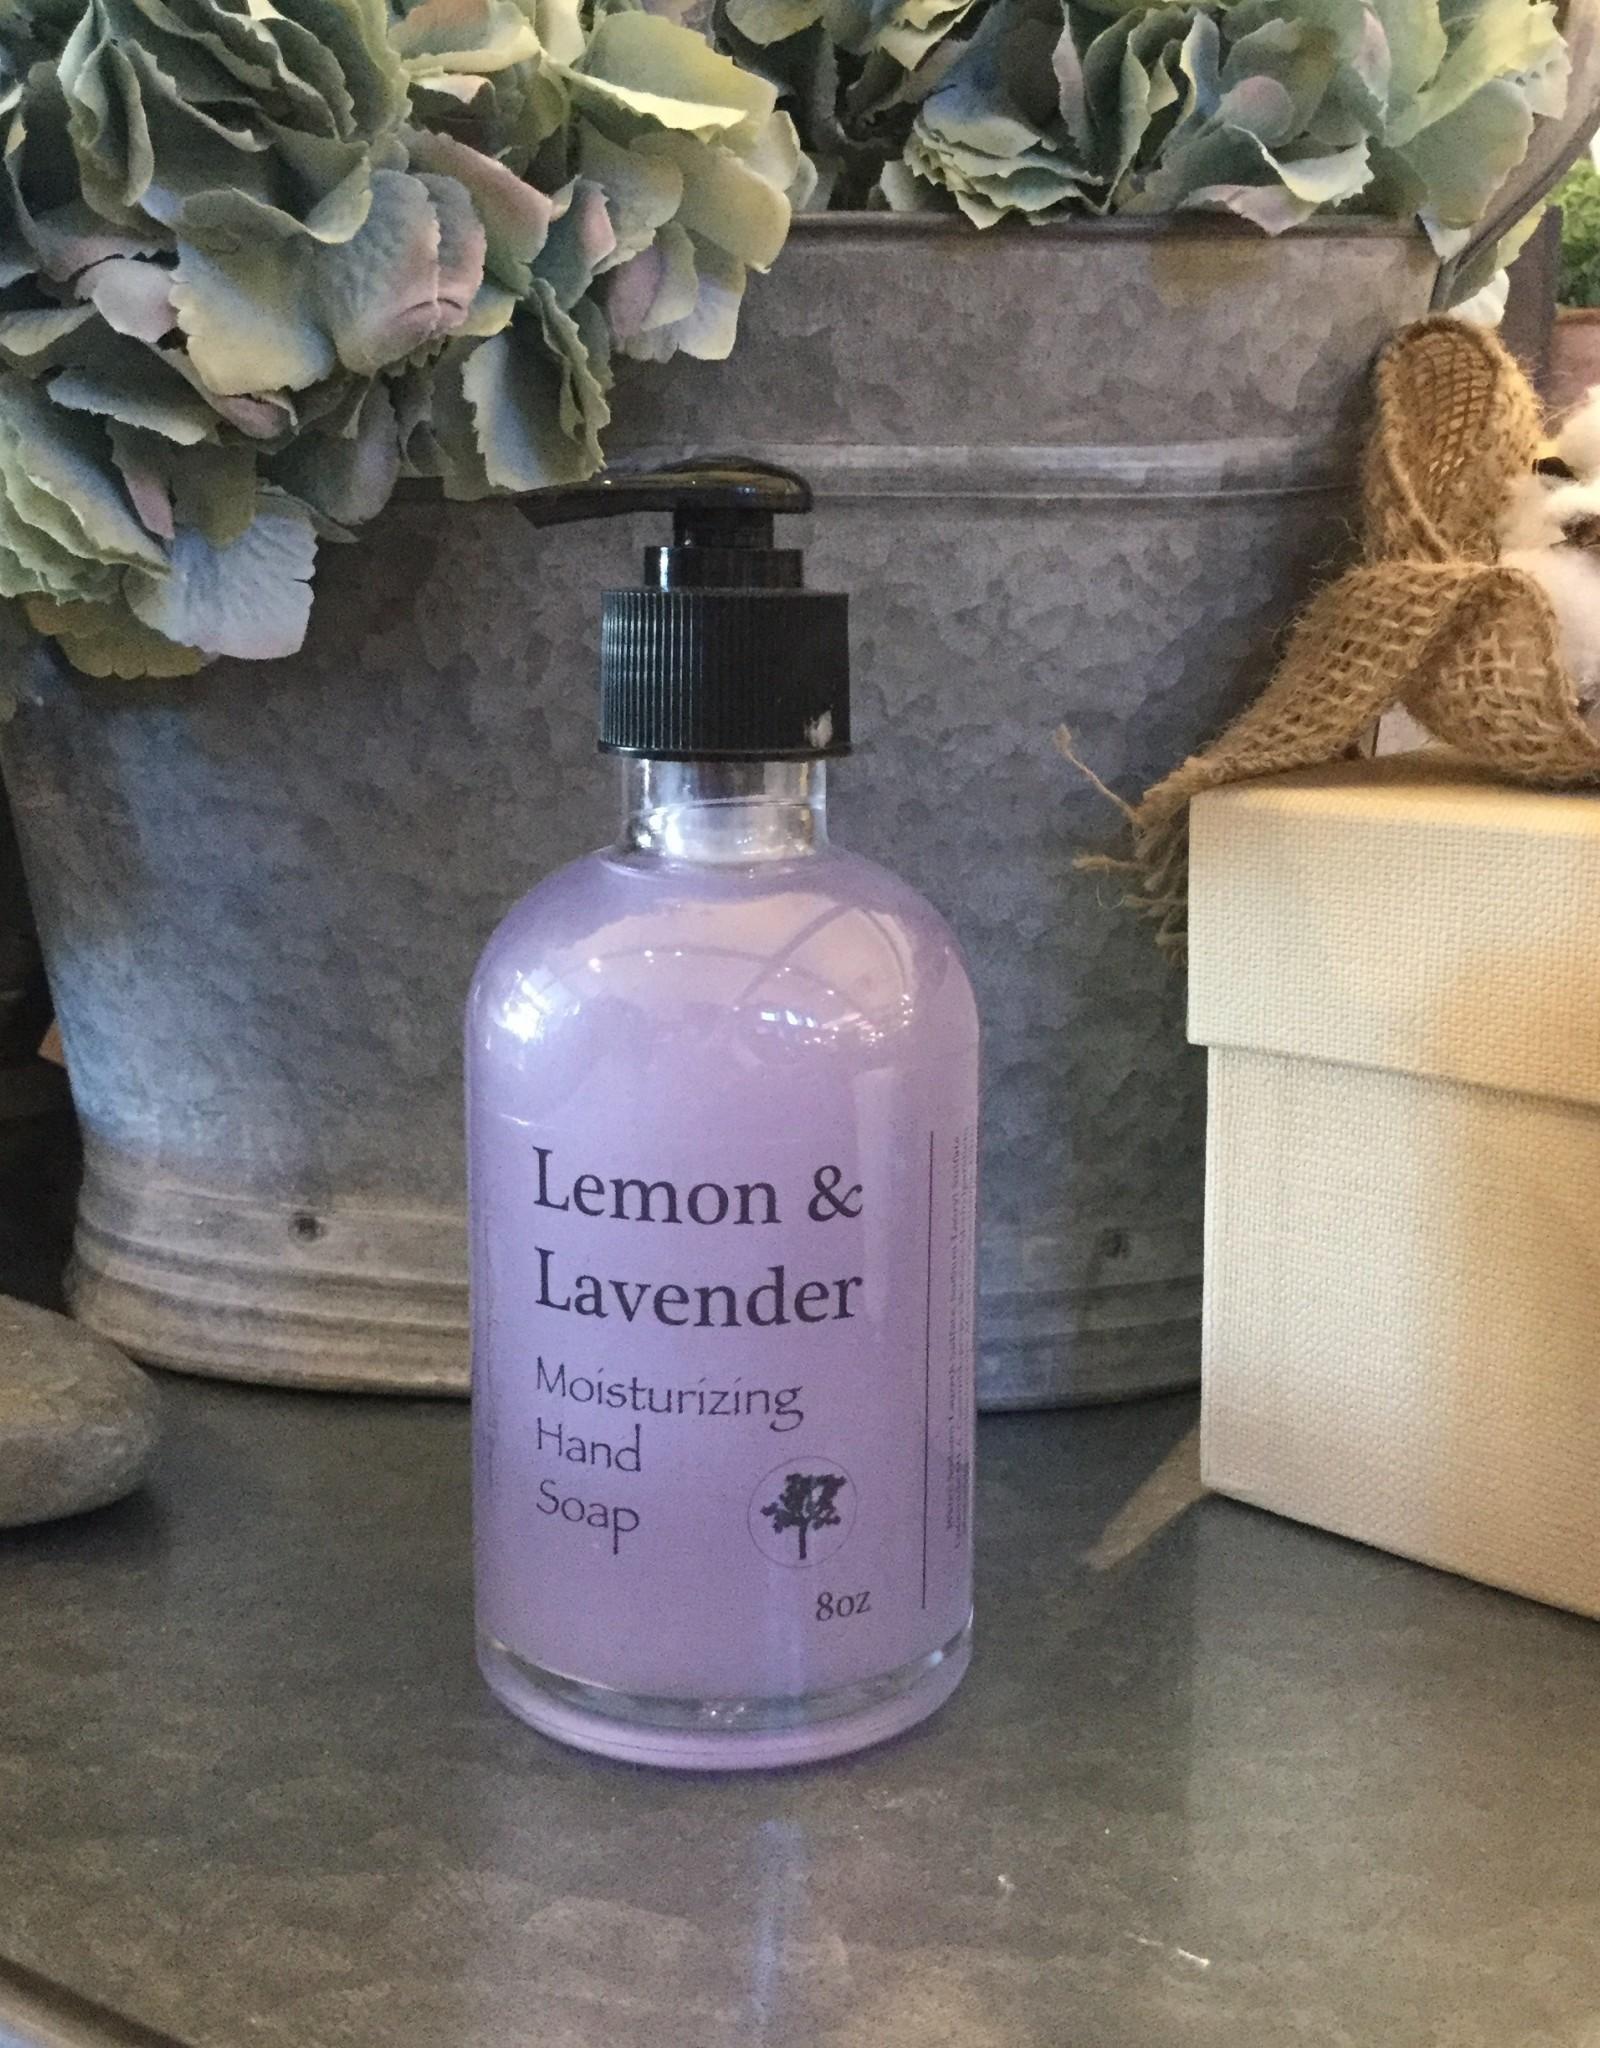 Hand Soap 8oz- Lemon & Lavender